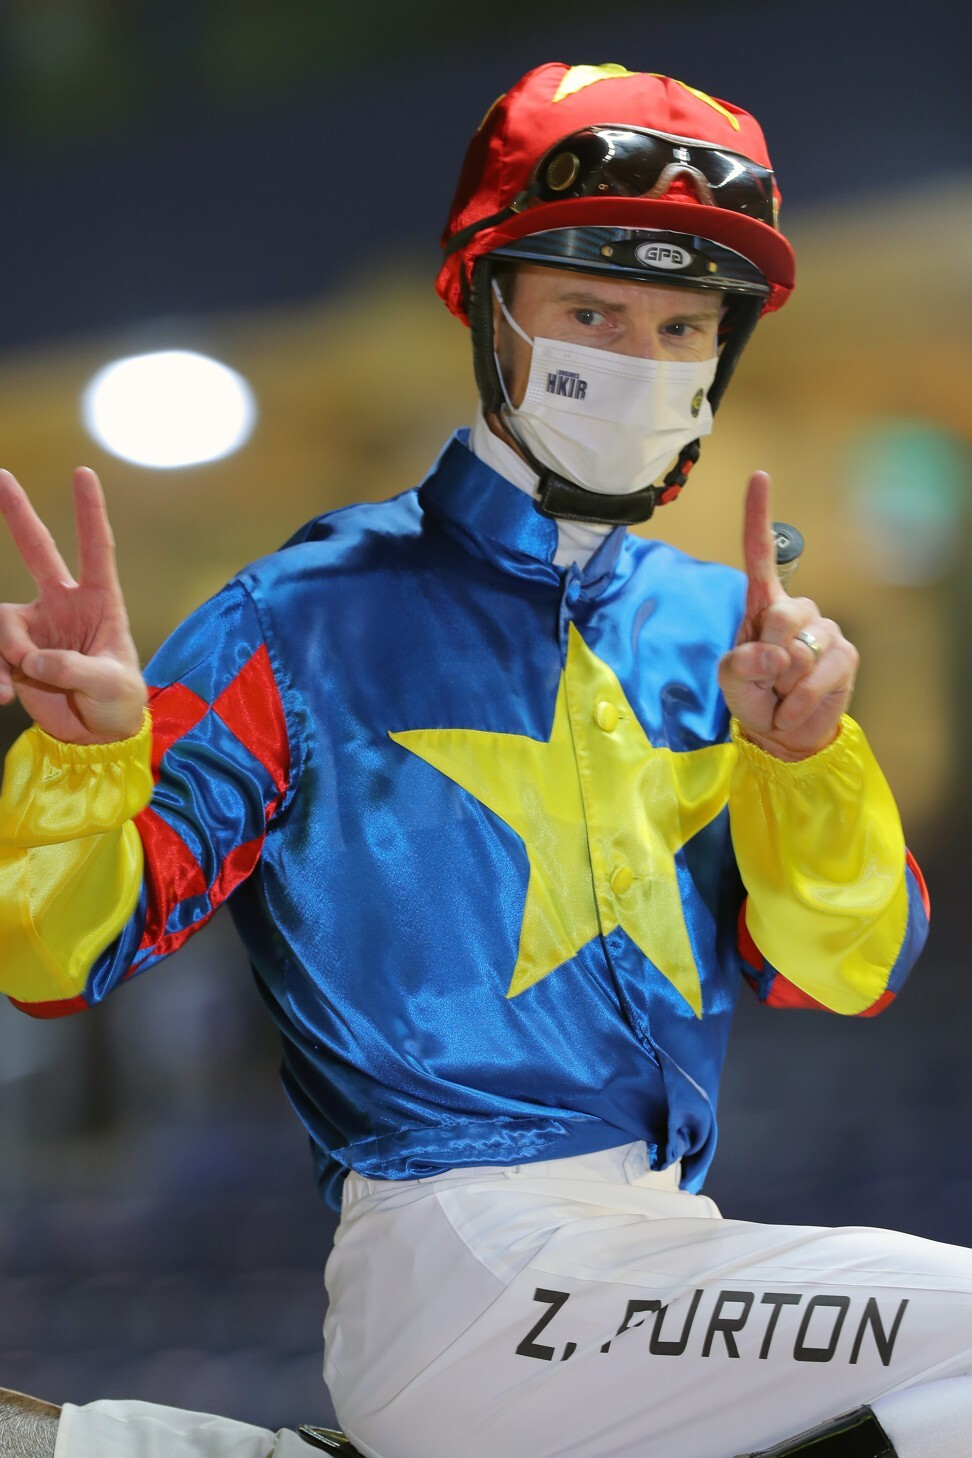 Zac Purton celebrates his 1,200th Hong Kong win on Wednesday night.